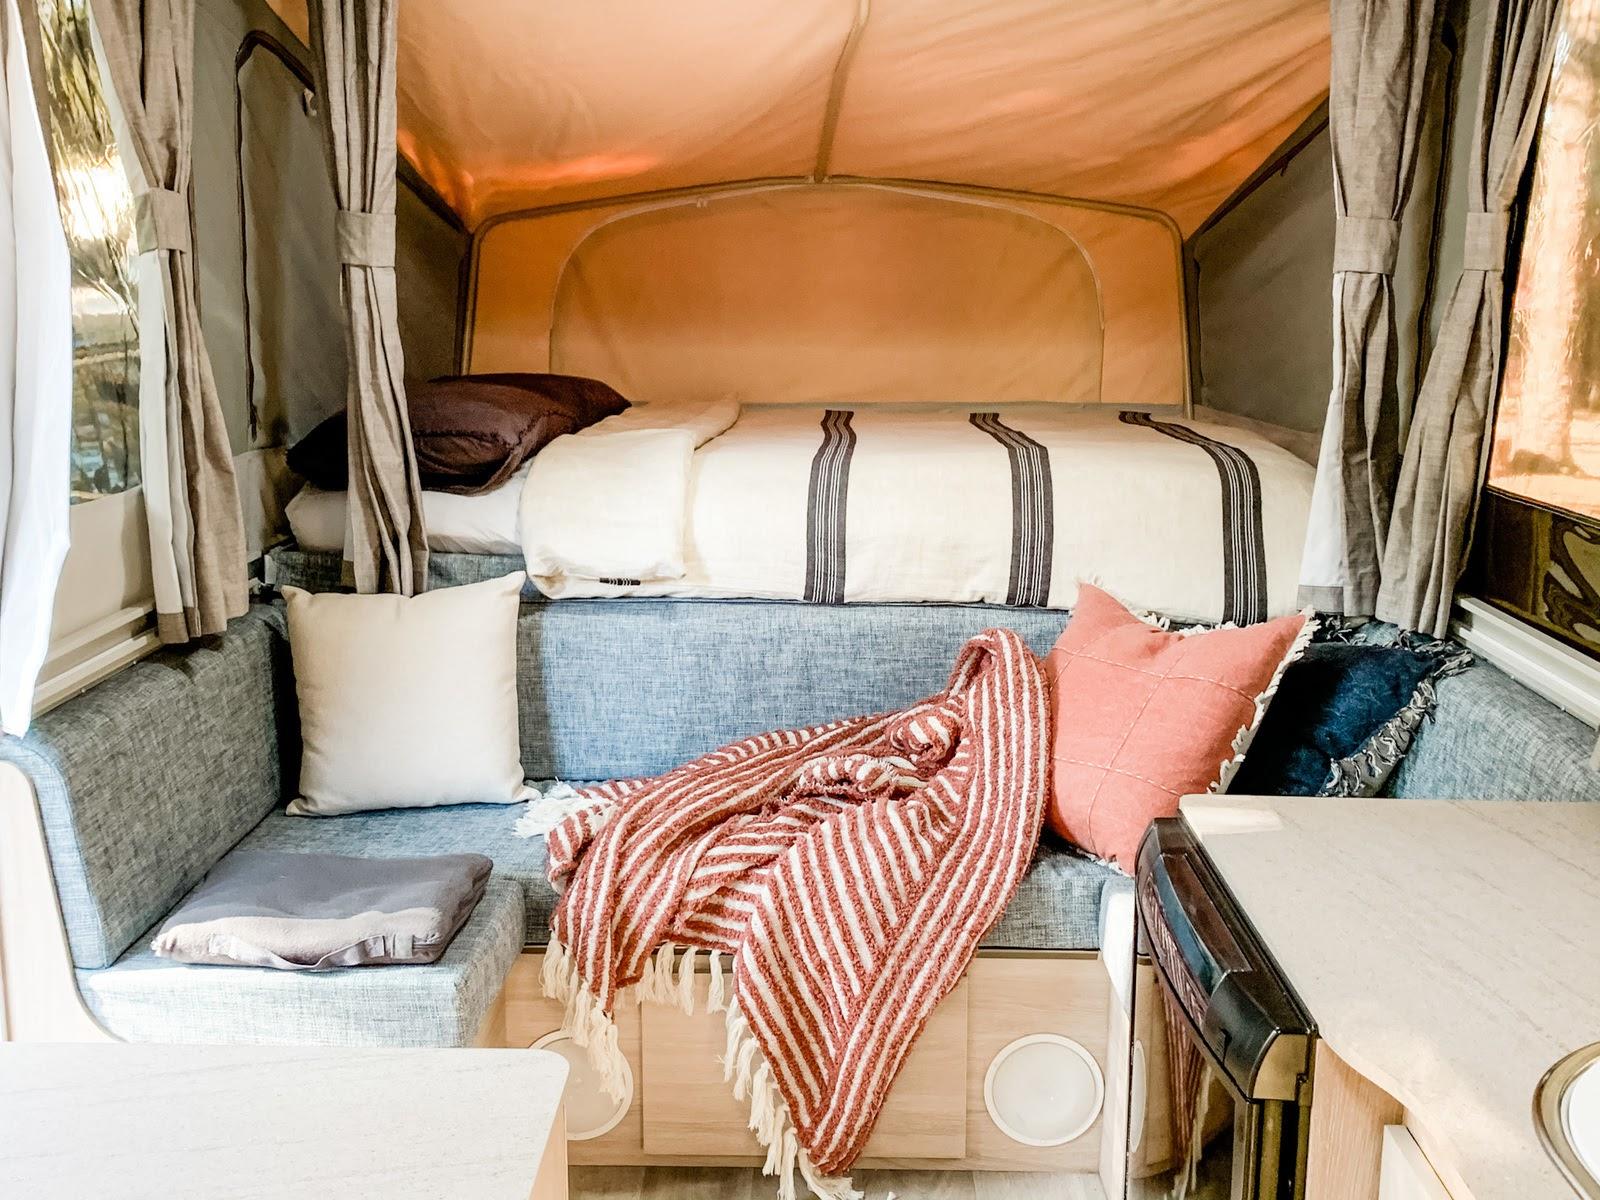 interior of Boho caravan